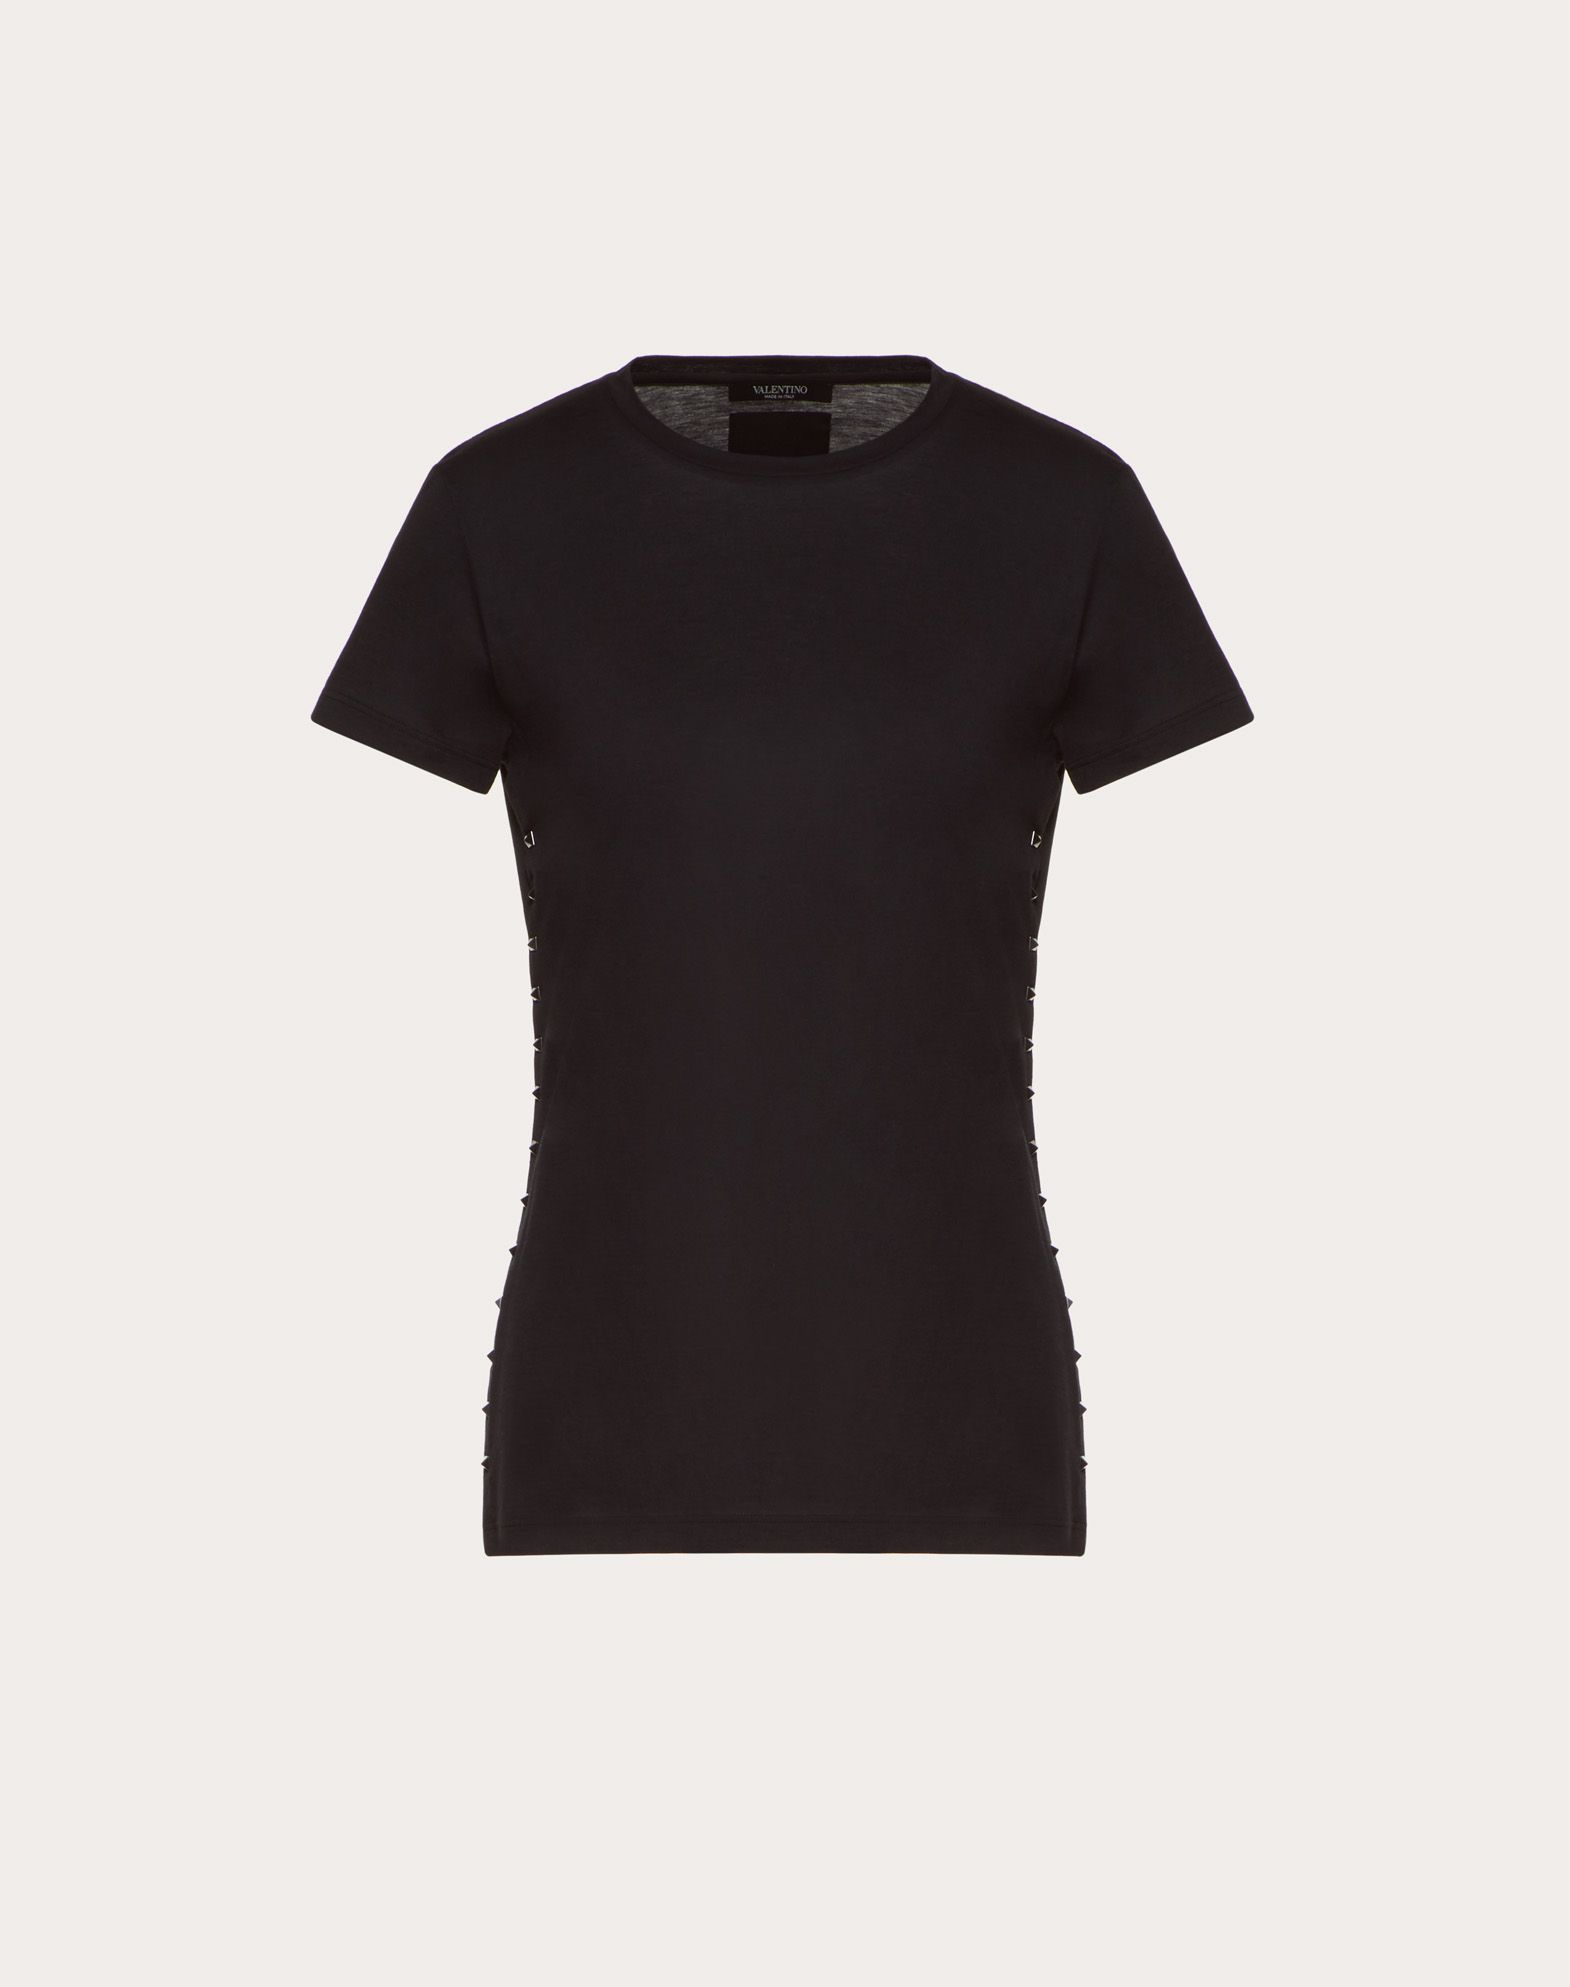 Rockstud Untitled Noir T-shirt